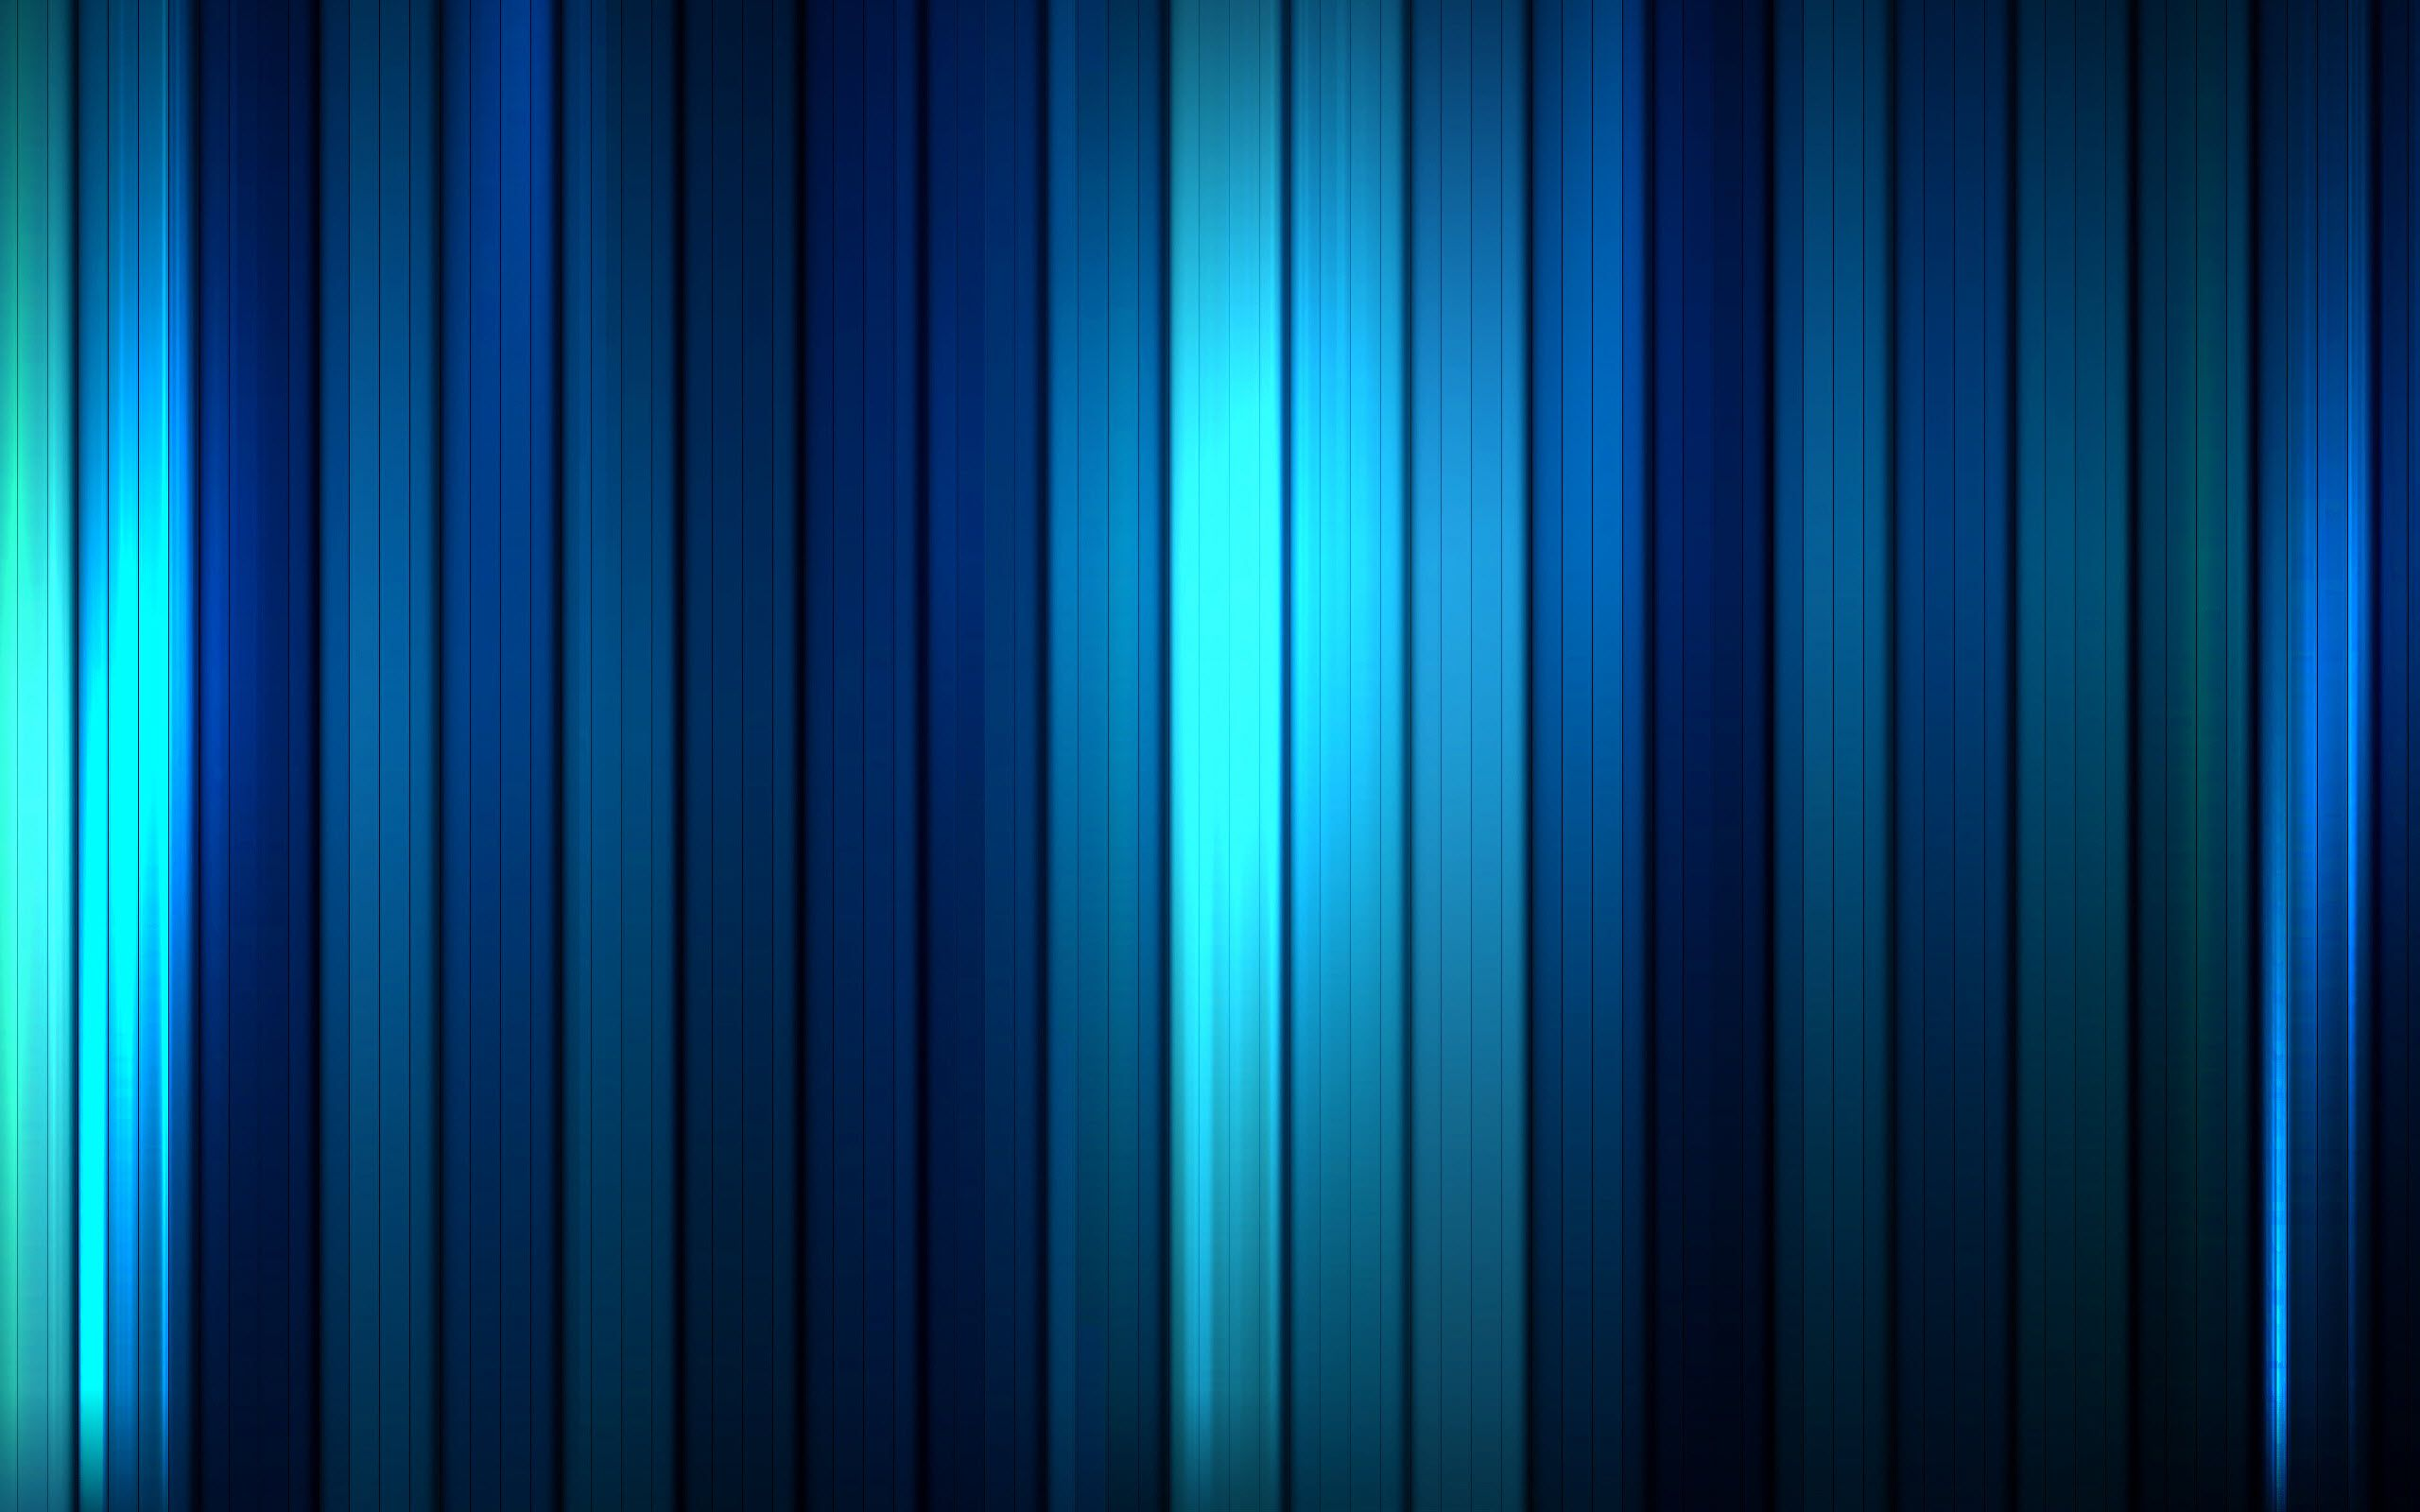 Free Download Fondos Azules Colores Fondo Azul Humo Blanco